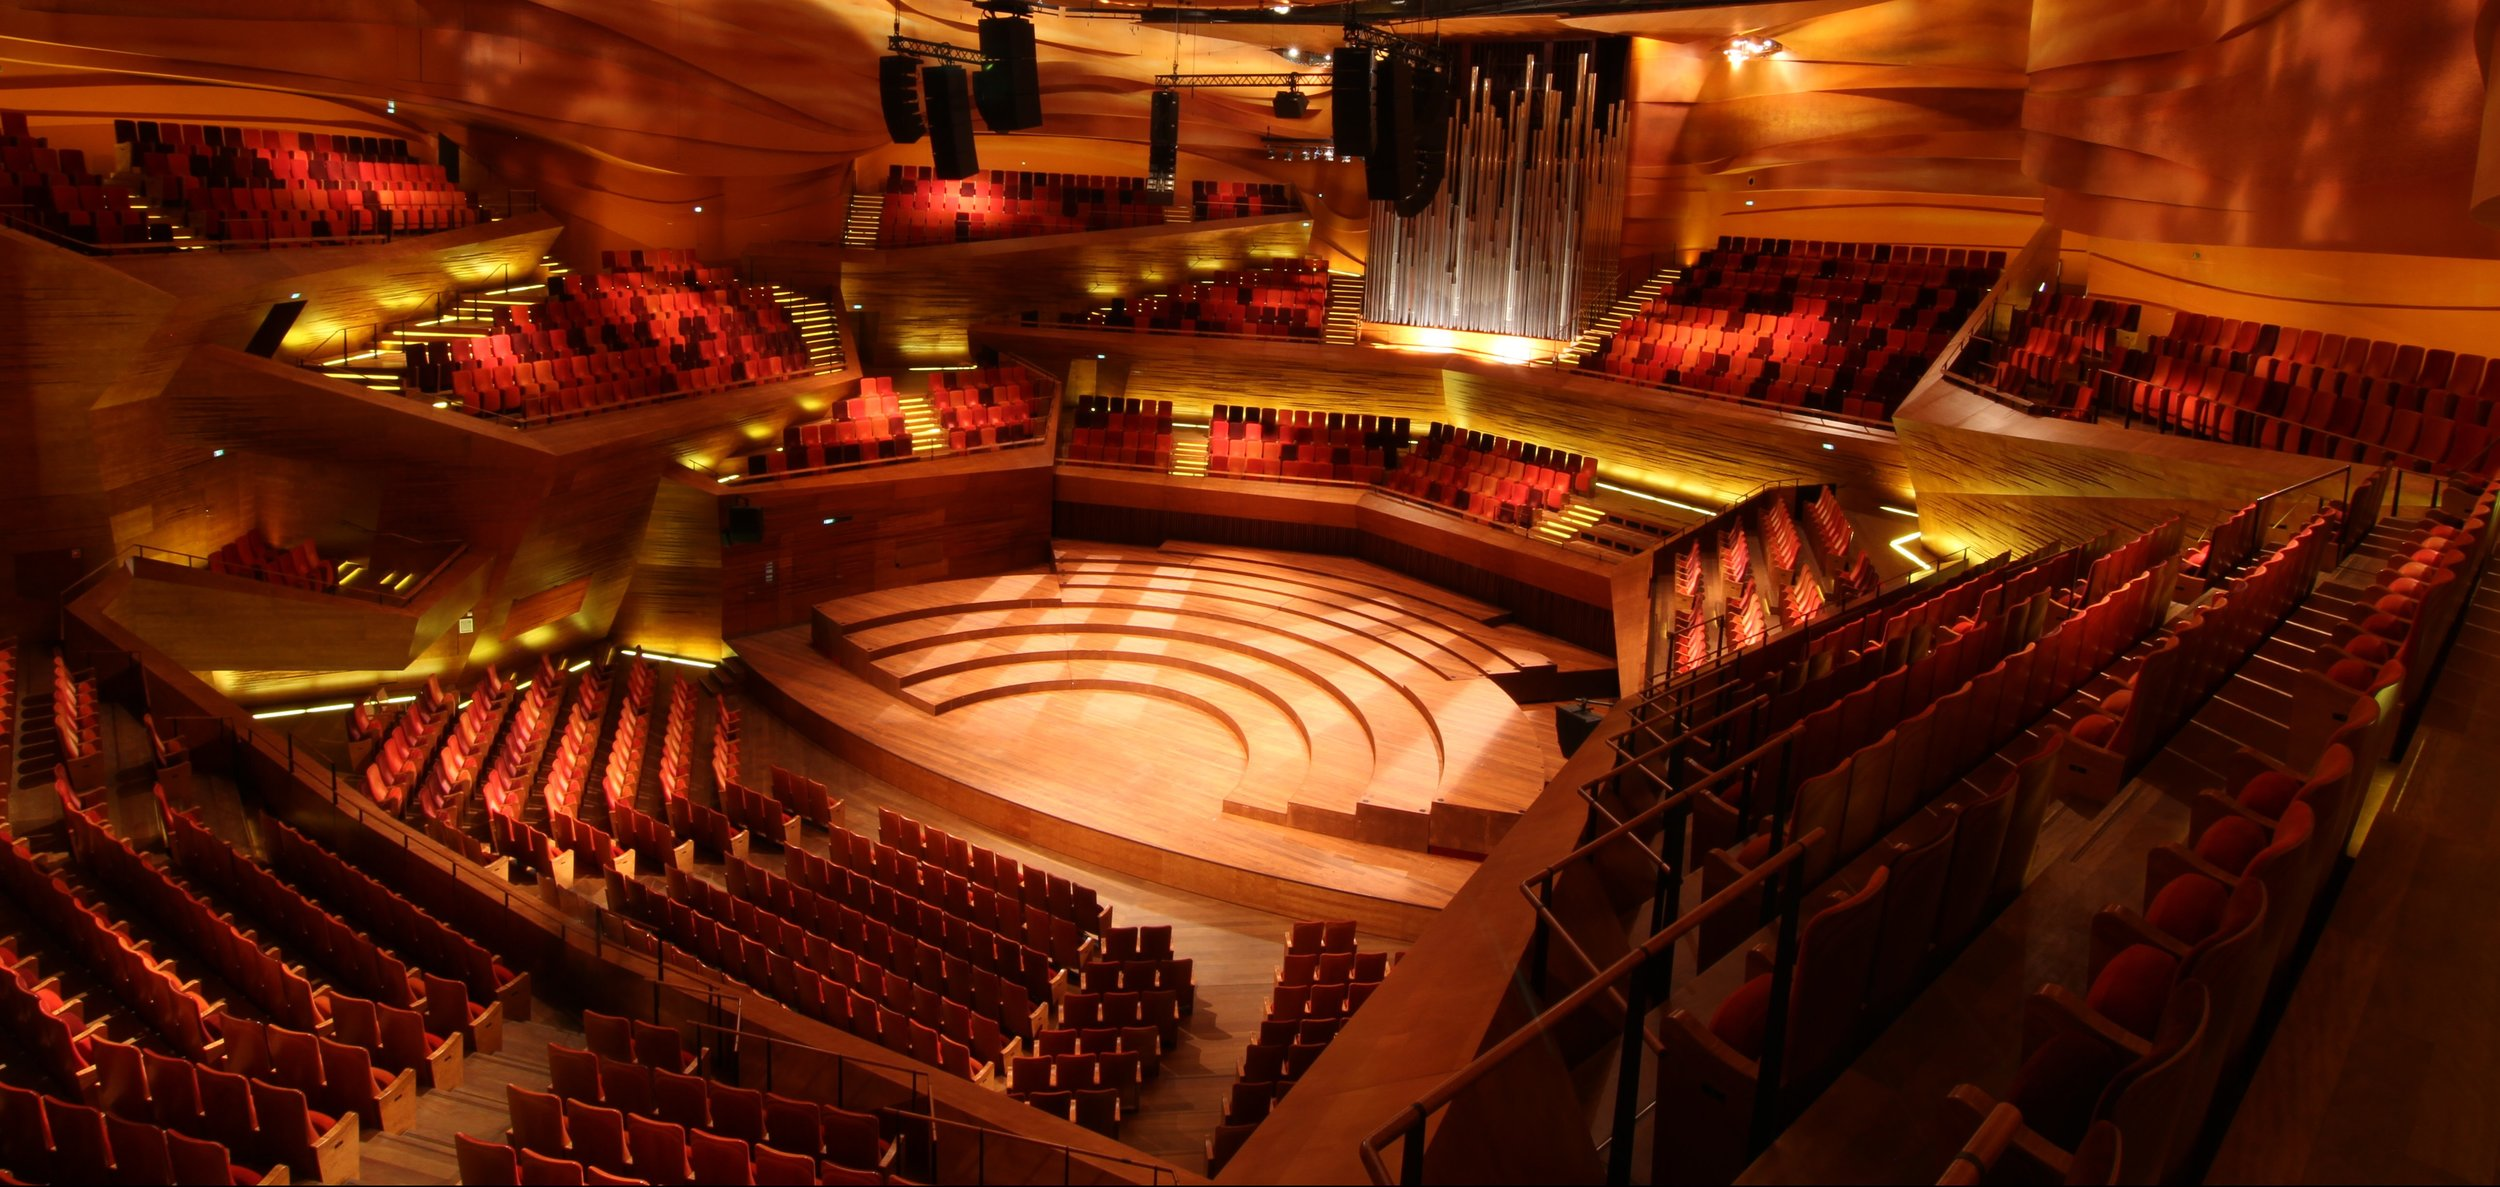 koncertsalen1.jpg